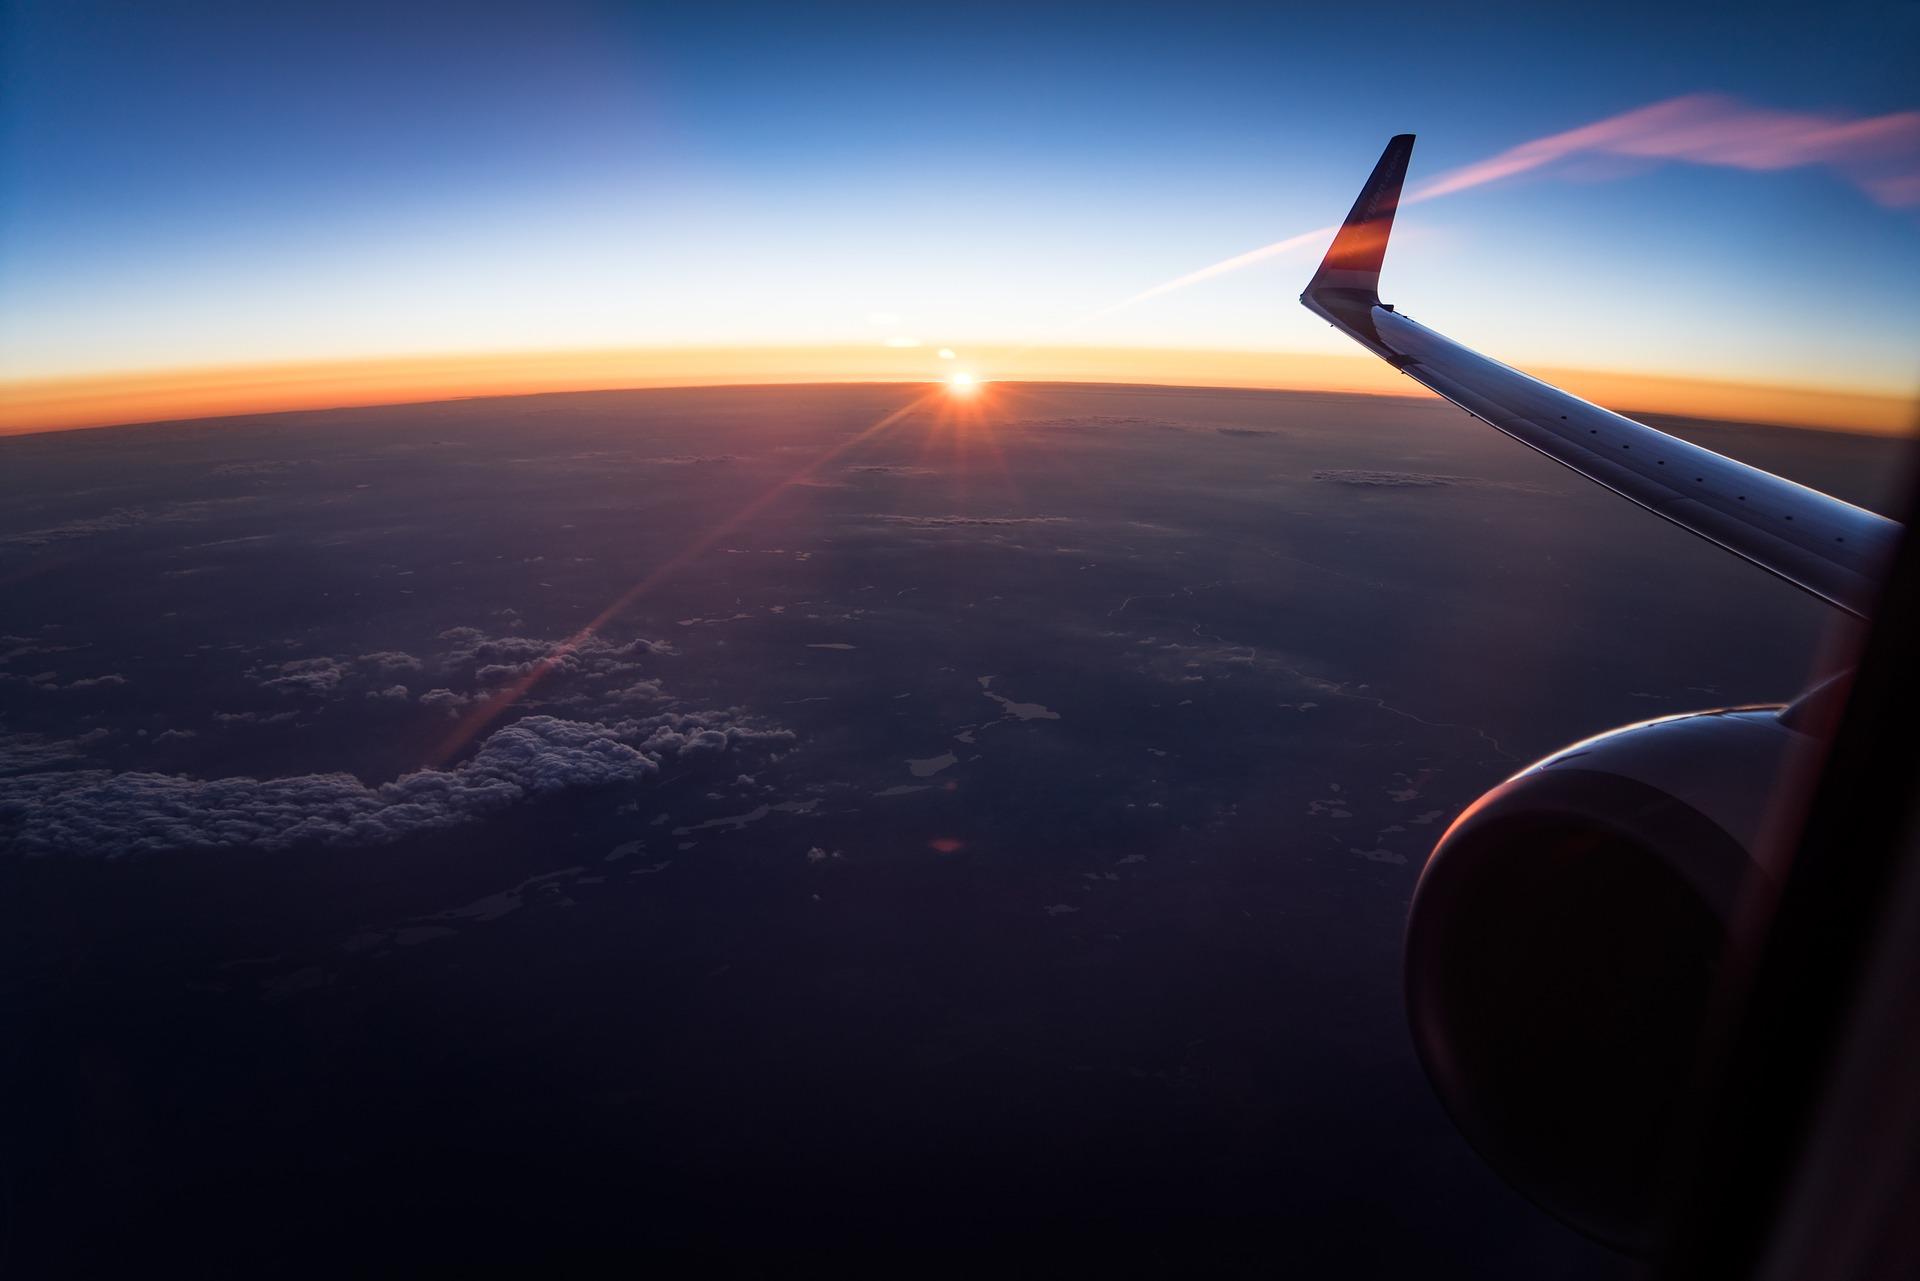 Flug verfolgen